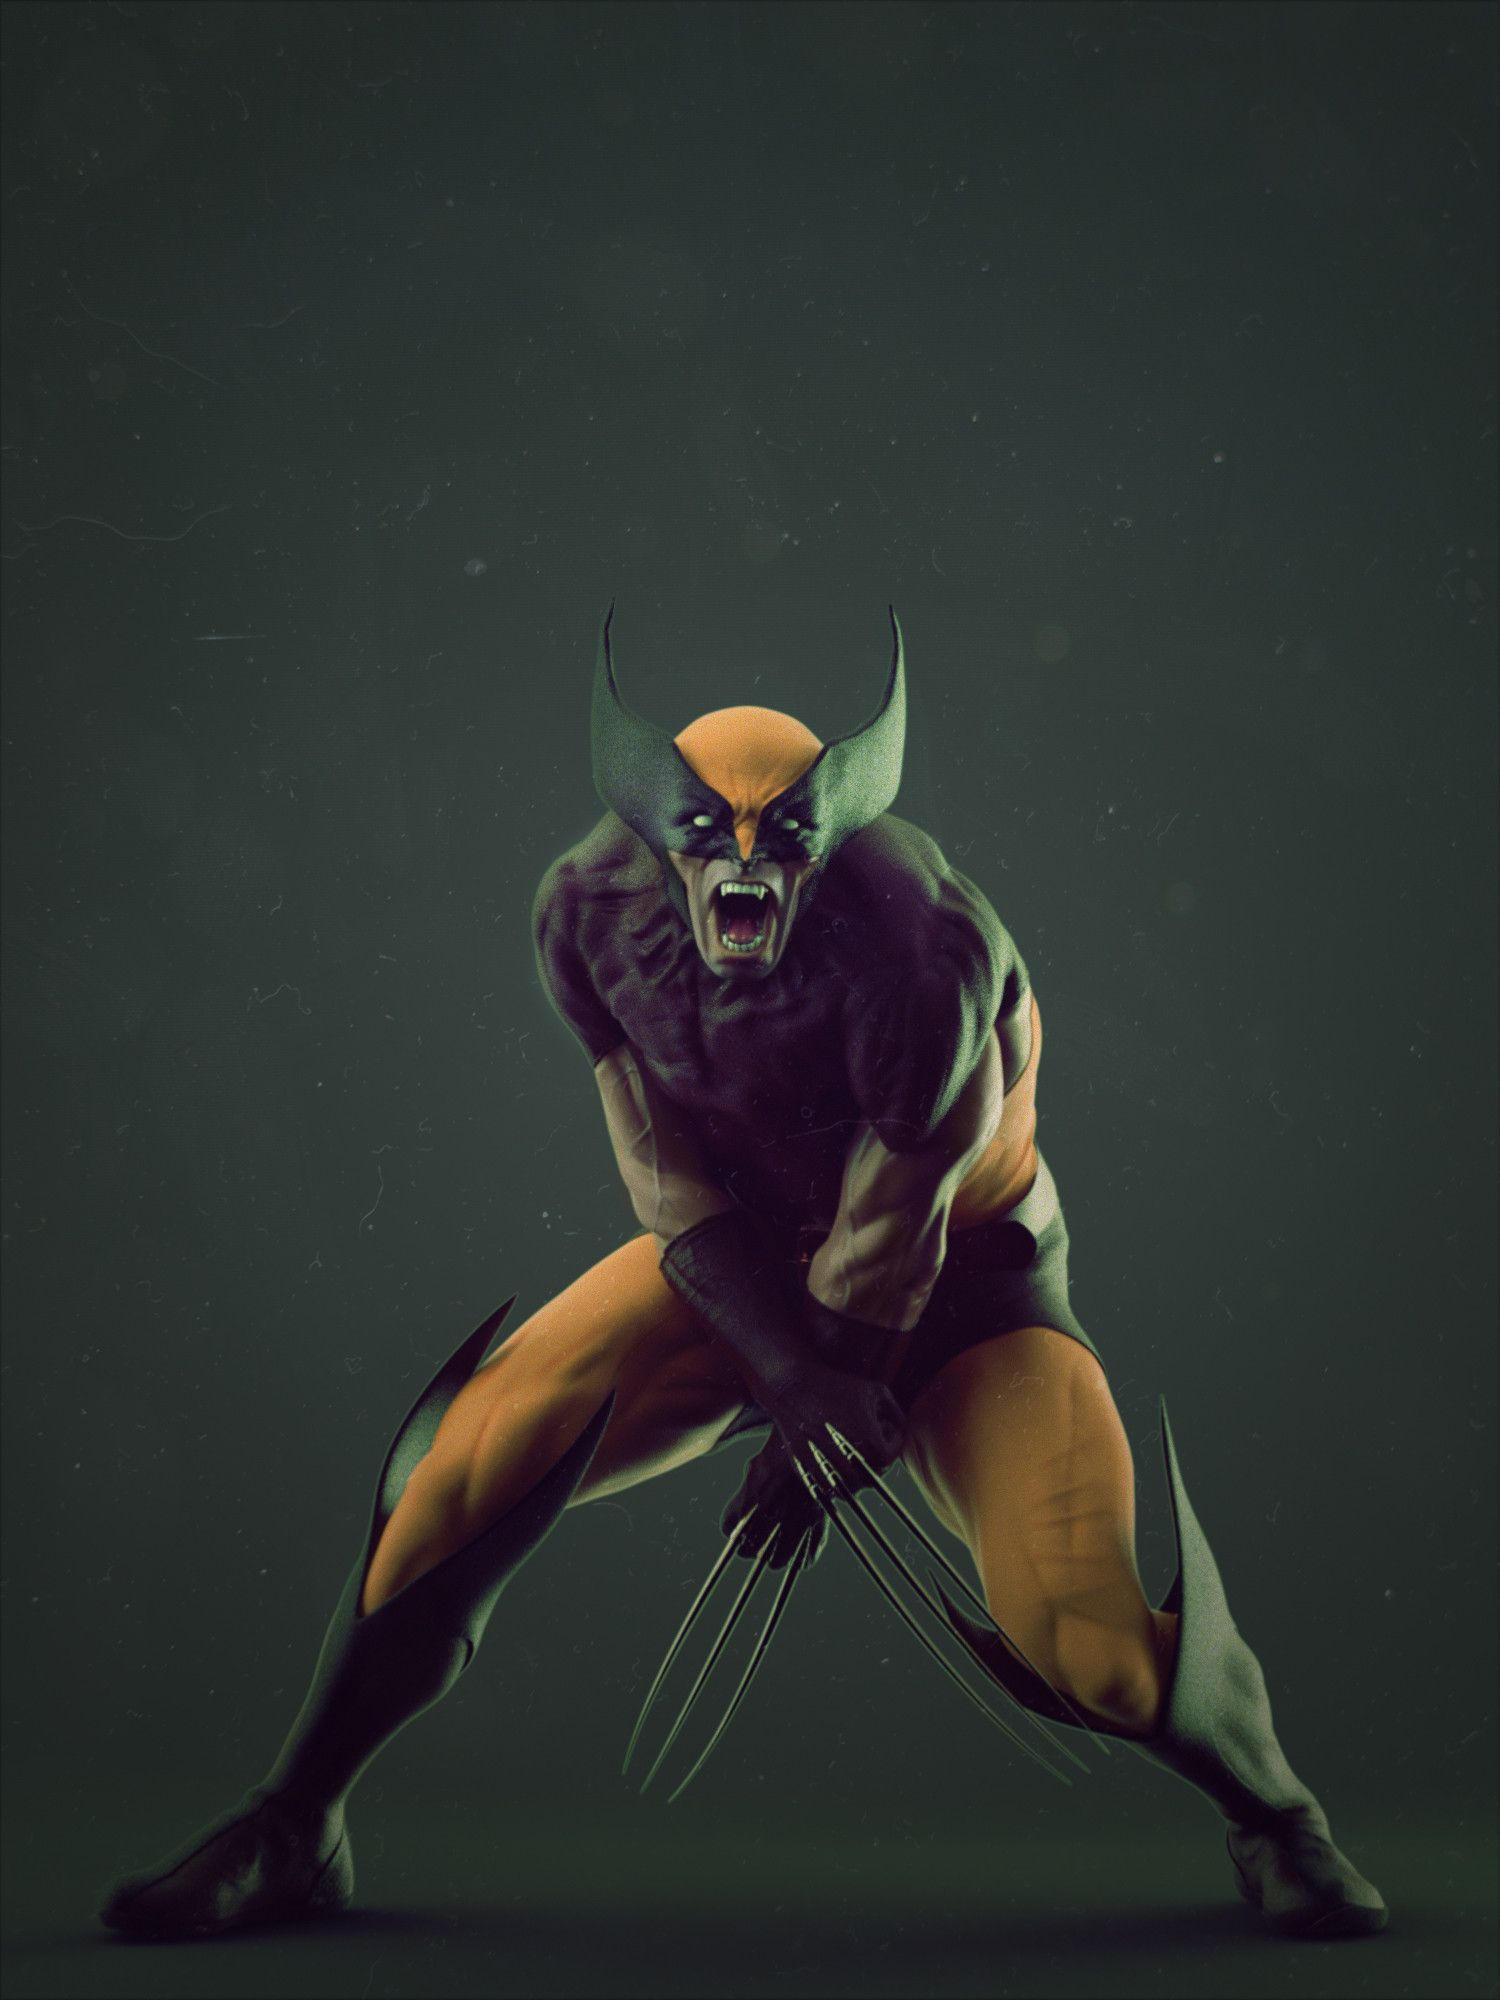 Pin by caption entertainment on cgi wolverine art - Wolverine cgi ...